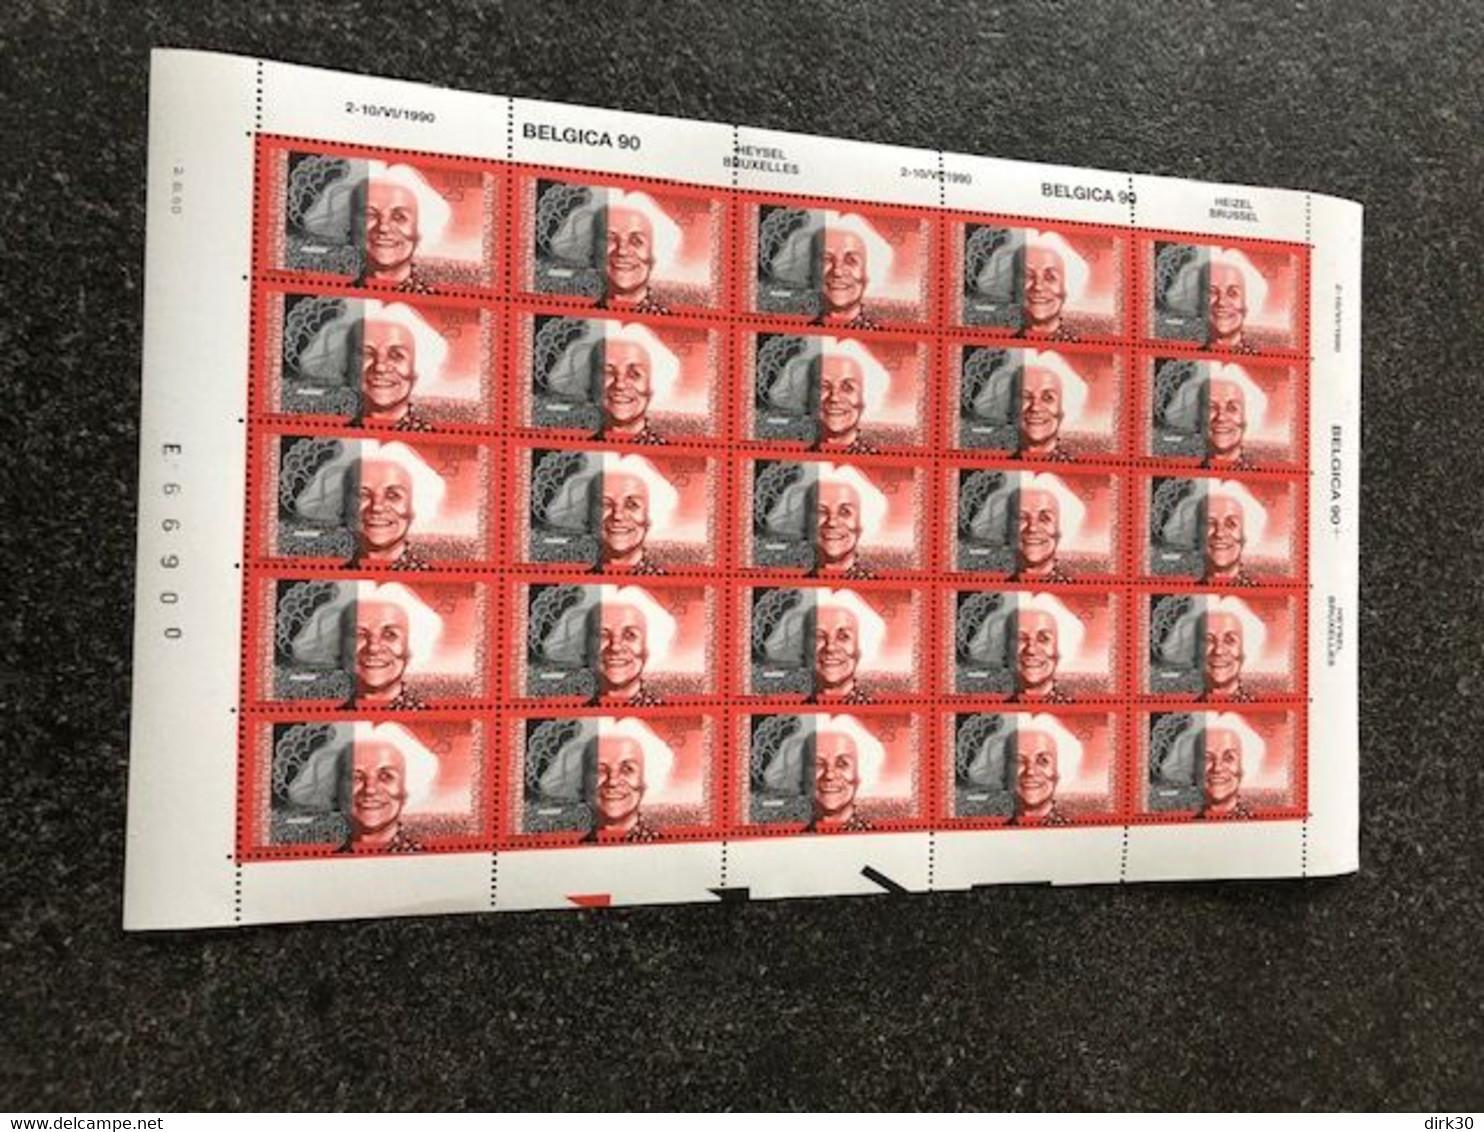 Belgie 1990 2360 Brunfaut FULL SHEET MNH Plaatnummer 0 - Volledige Vellen